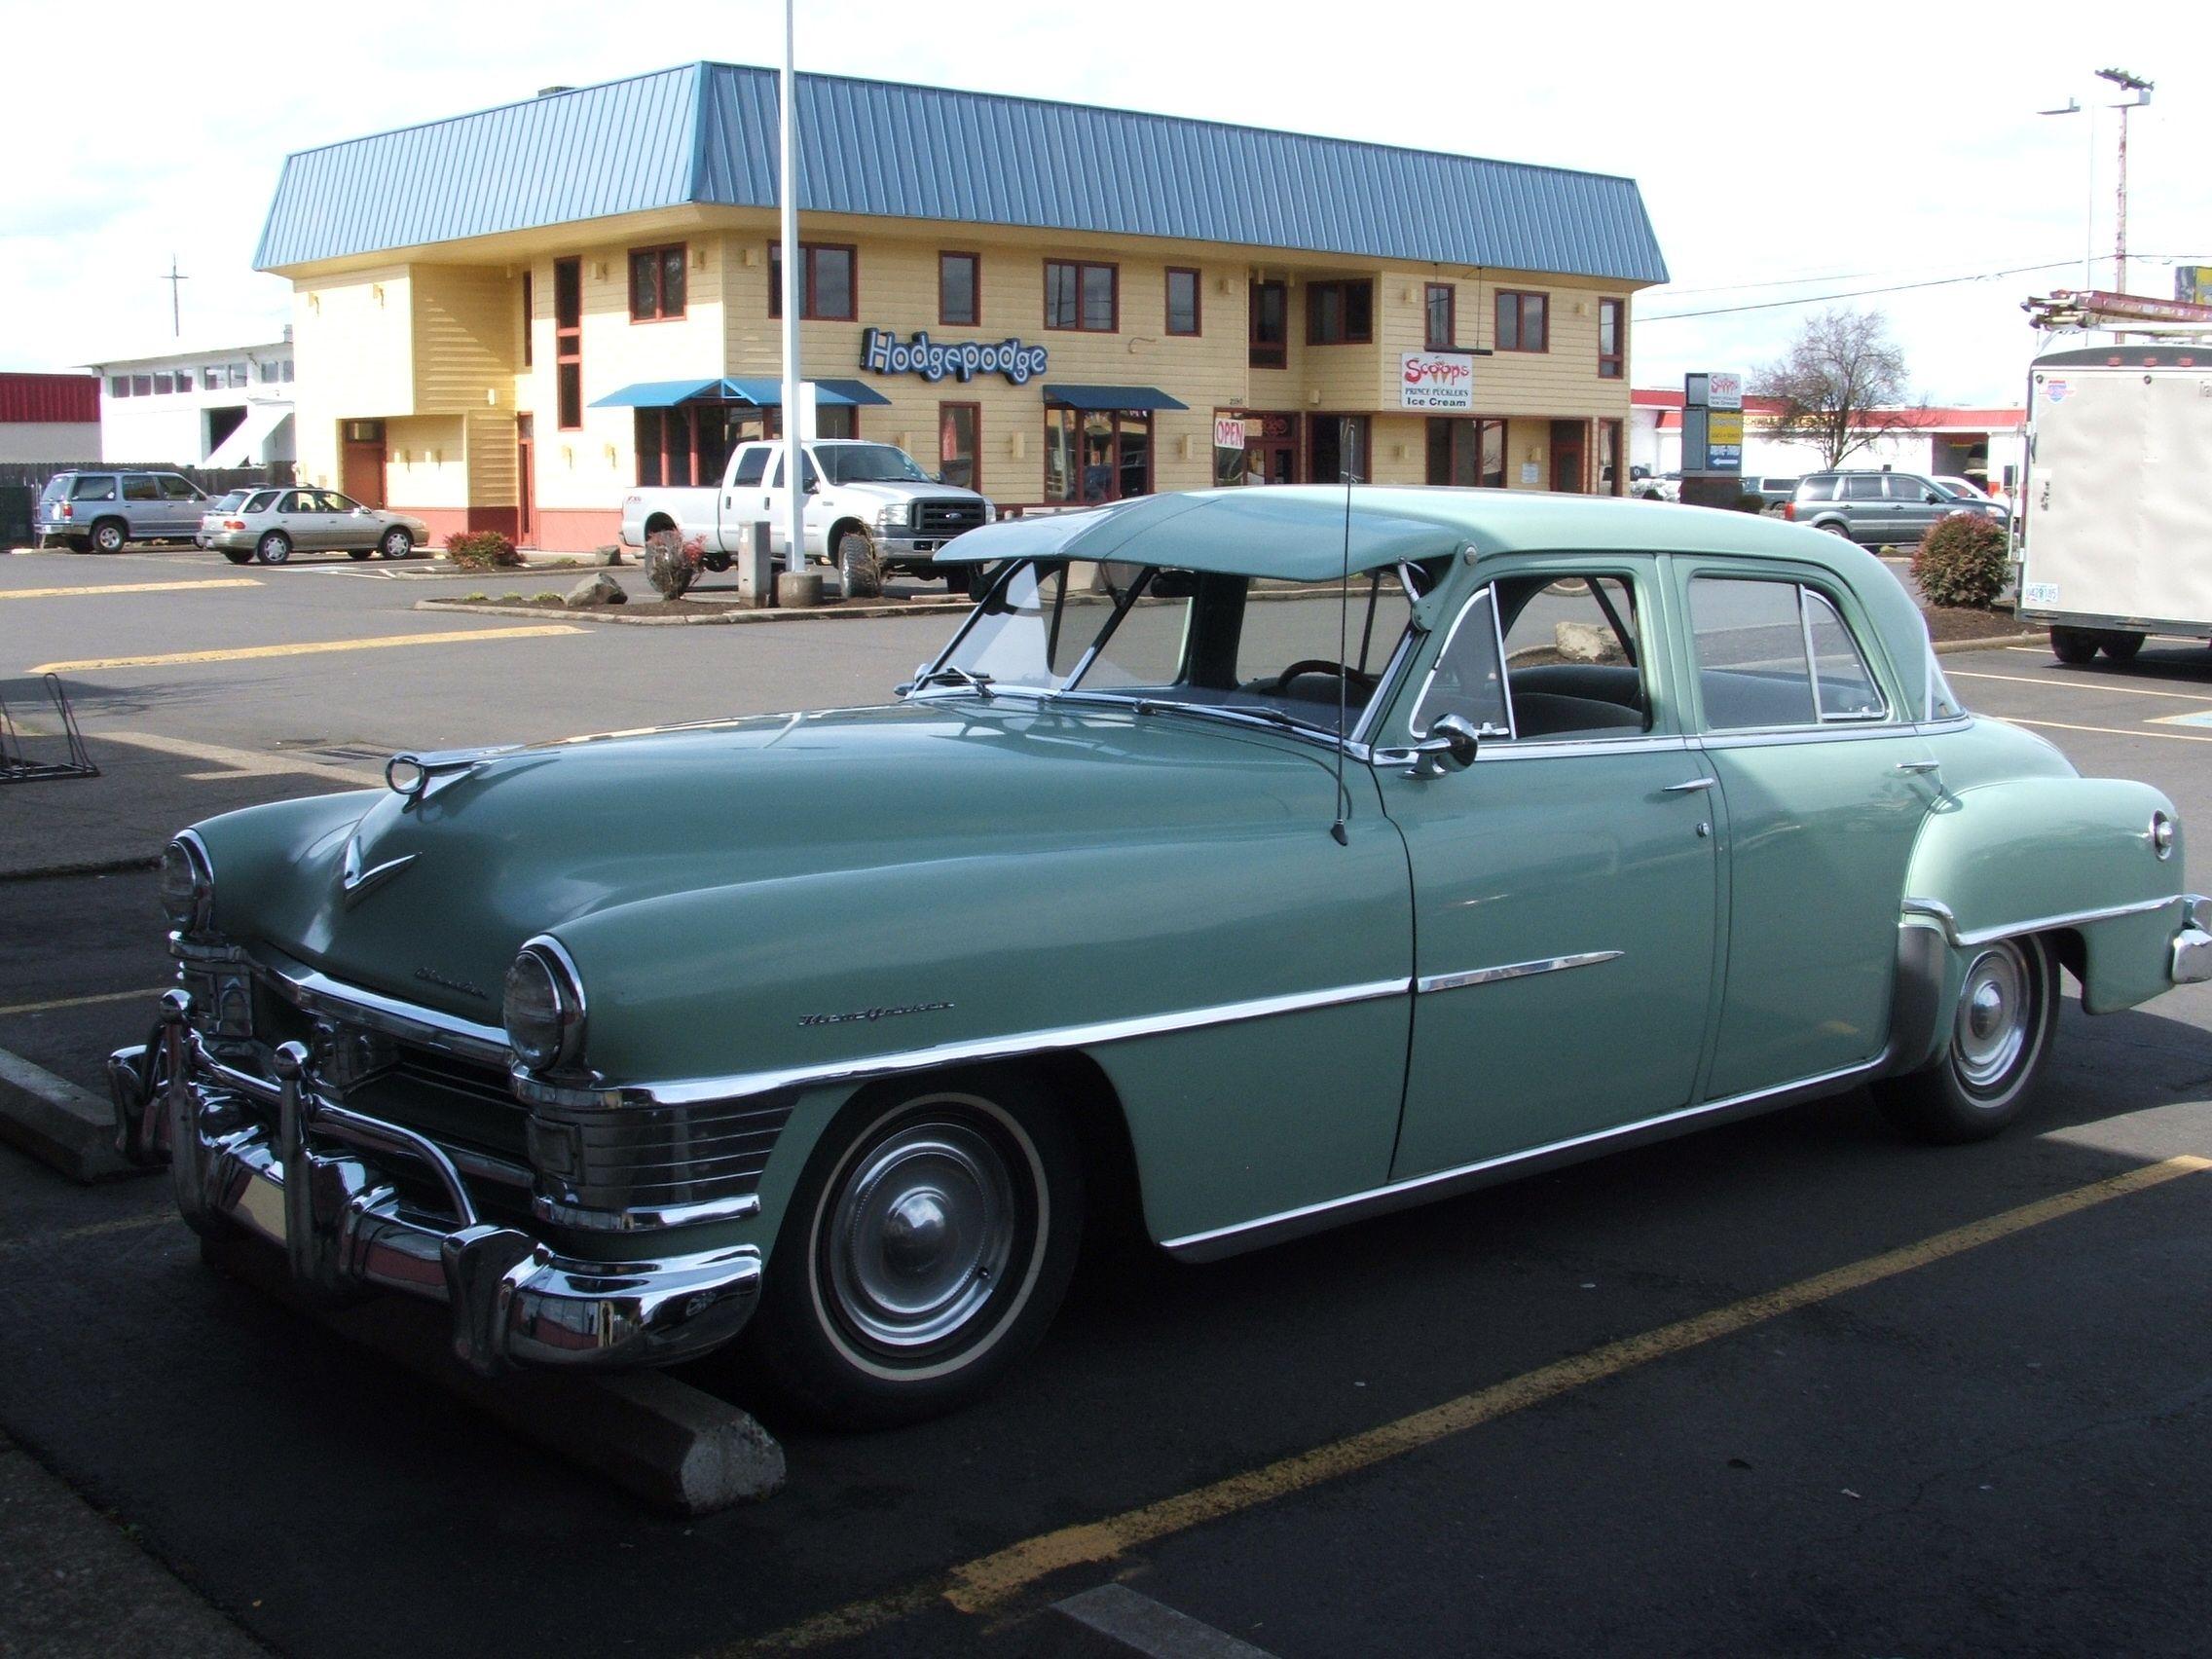 Be jealous of this 1951 Saratoga Chrysler, I know I am